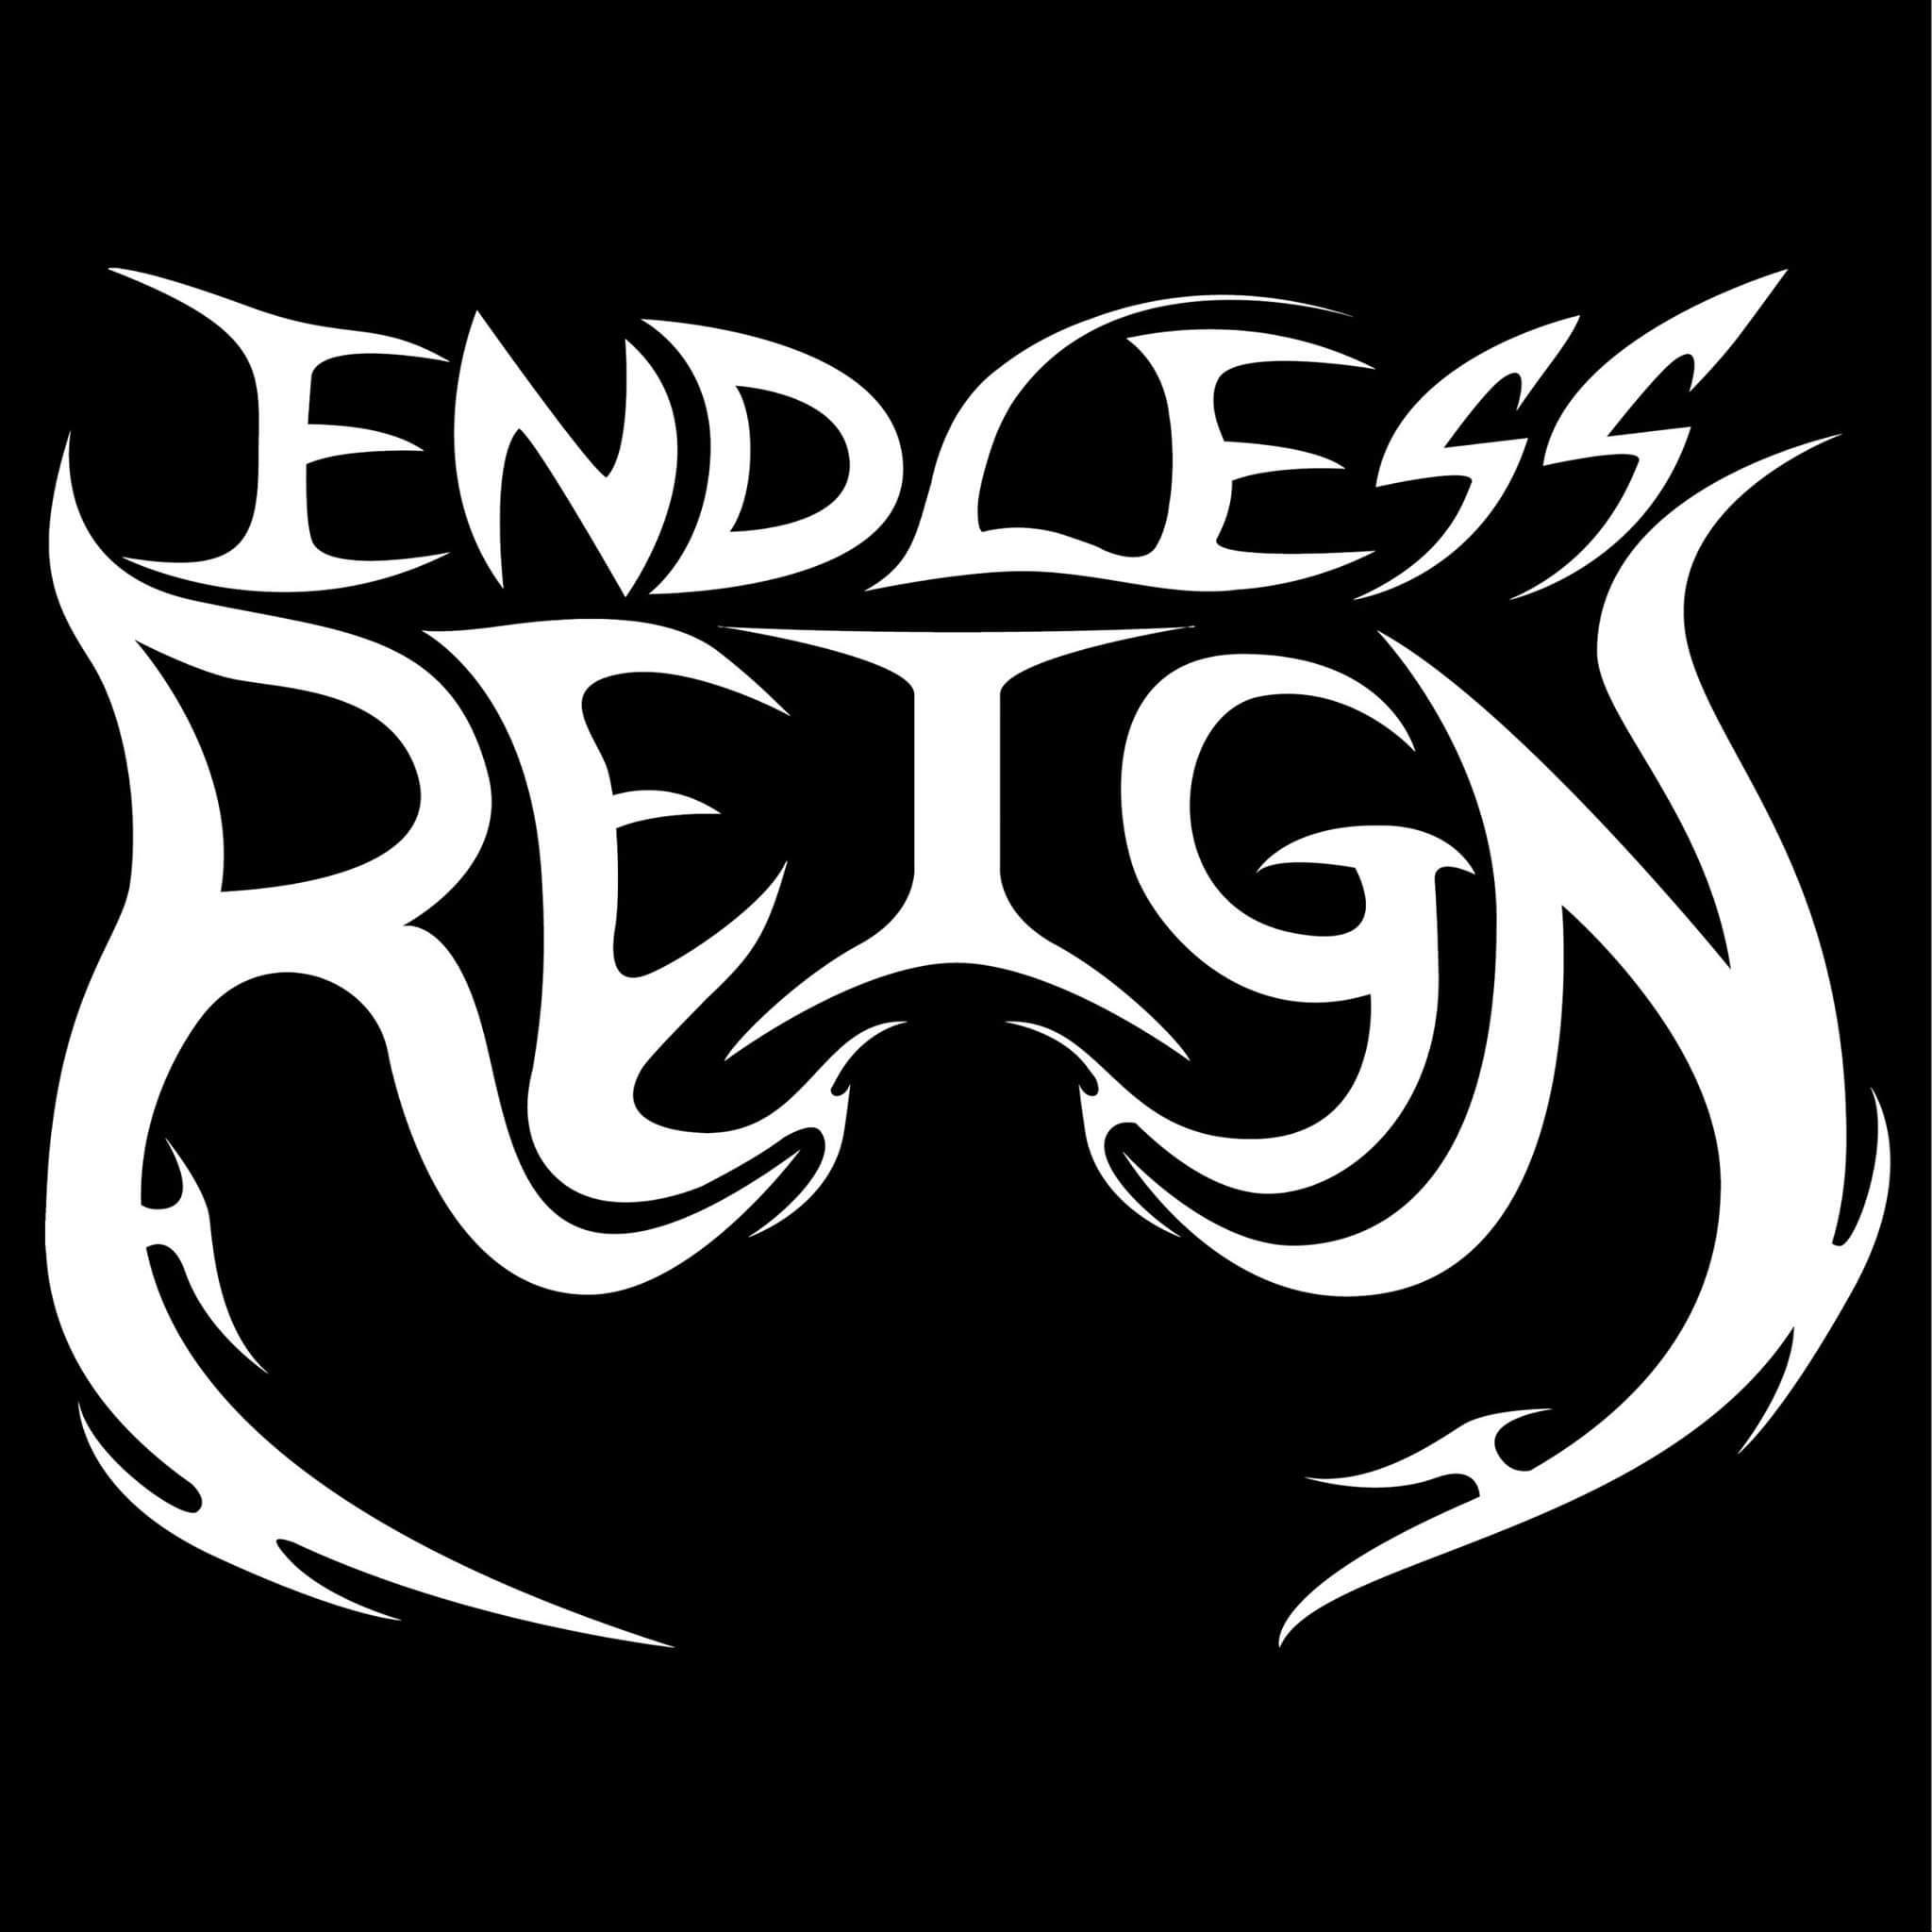 Endless Reign